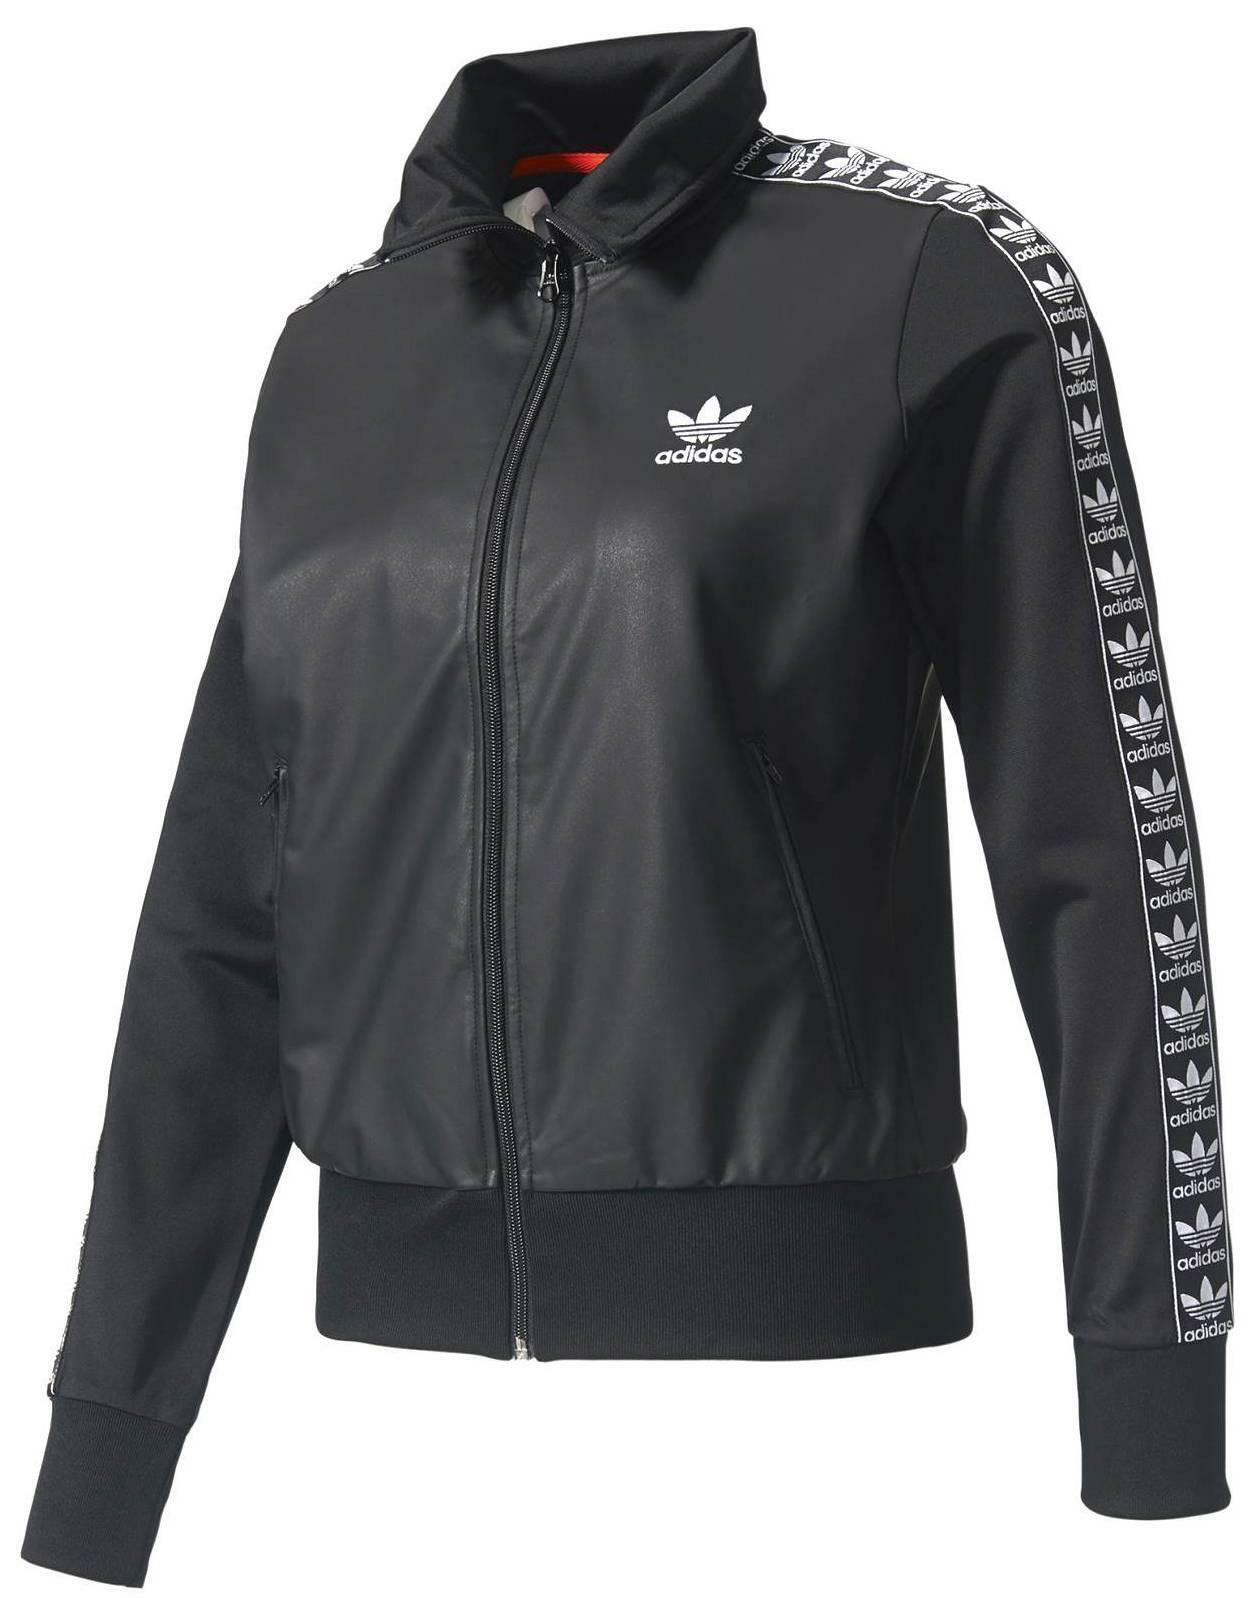 adidas adidas originals firebird tt giacchetto donna nero